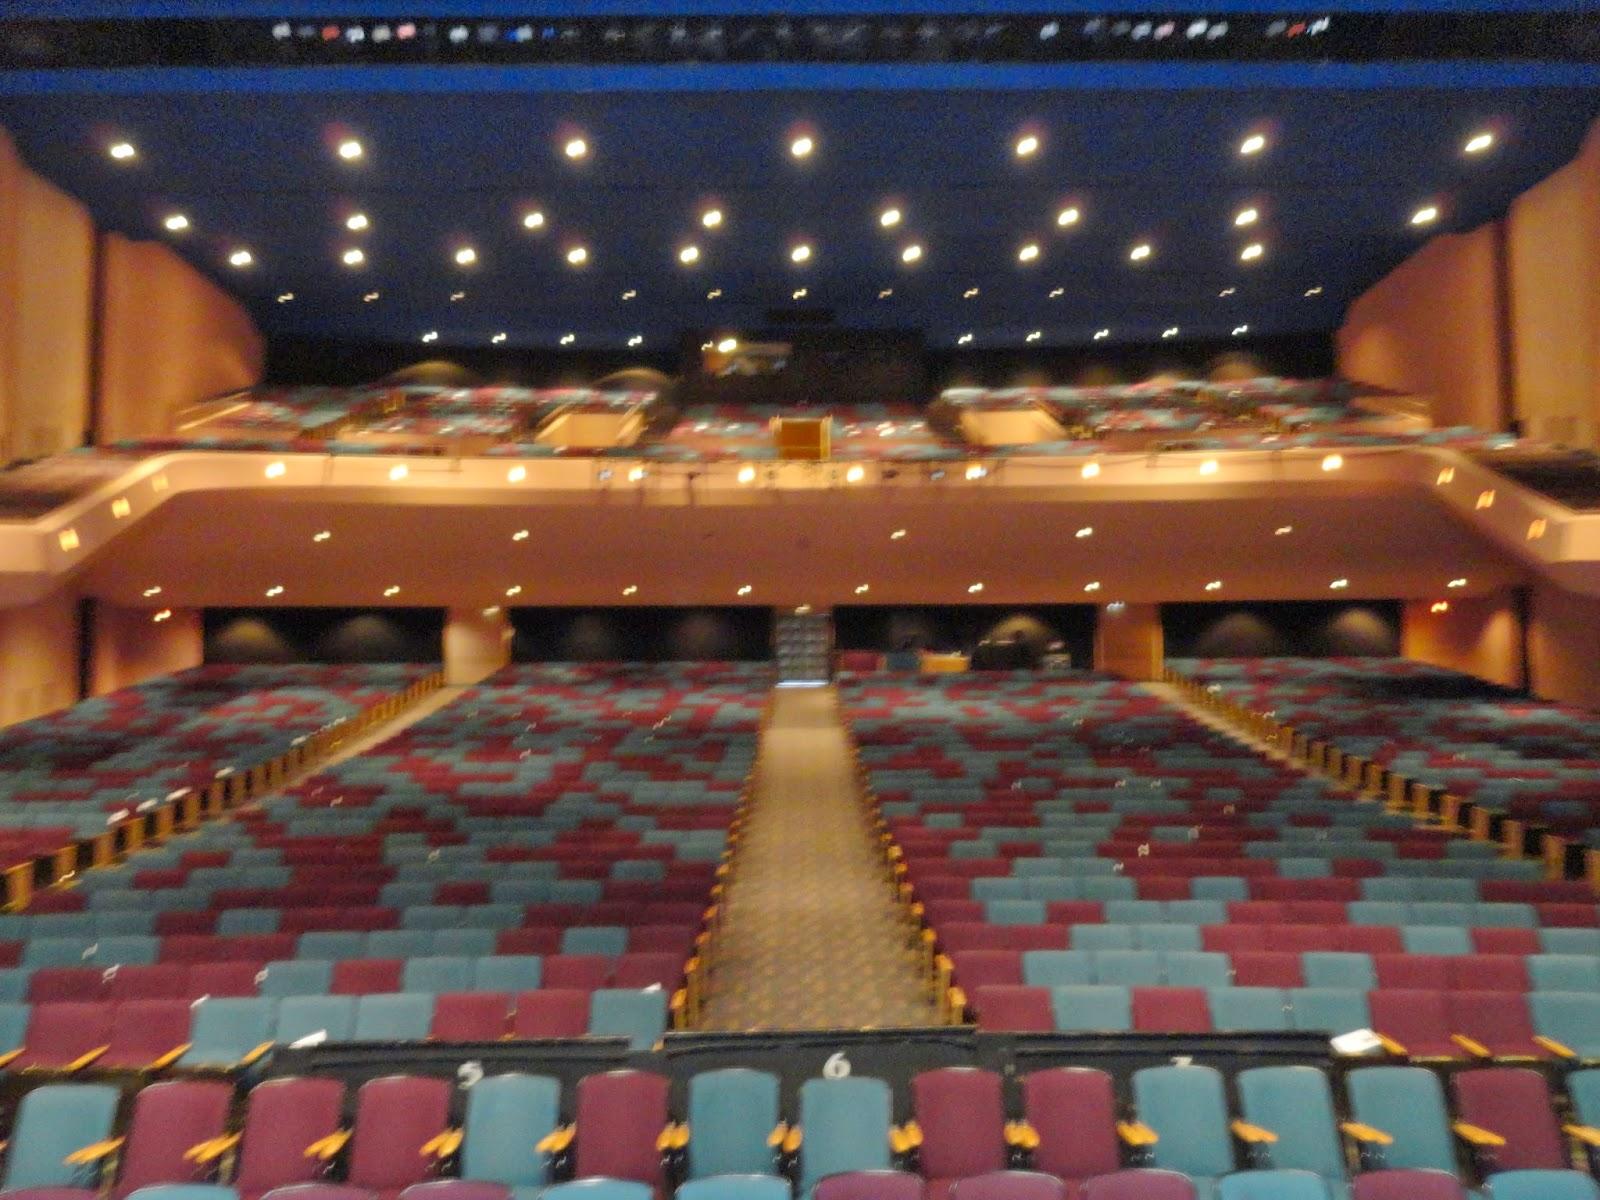 Stranahan Theater Toledo Seating